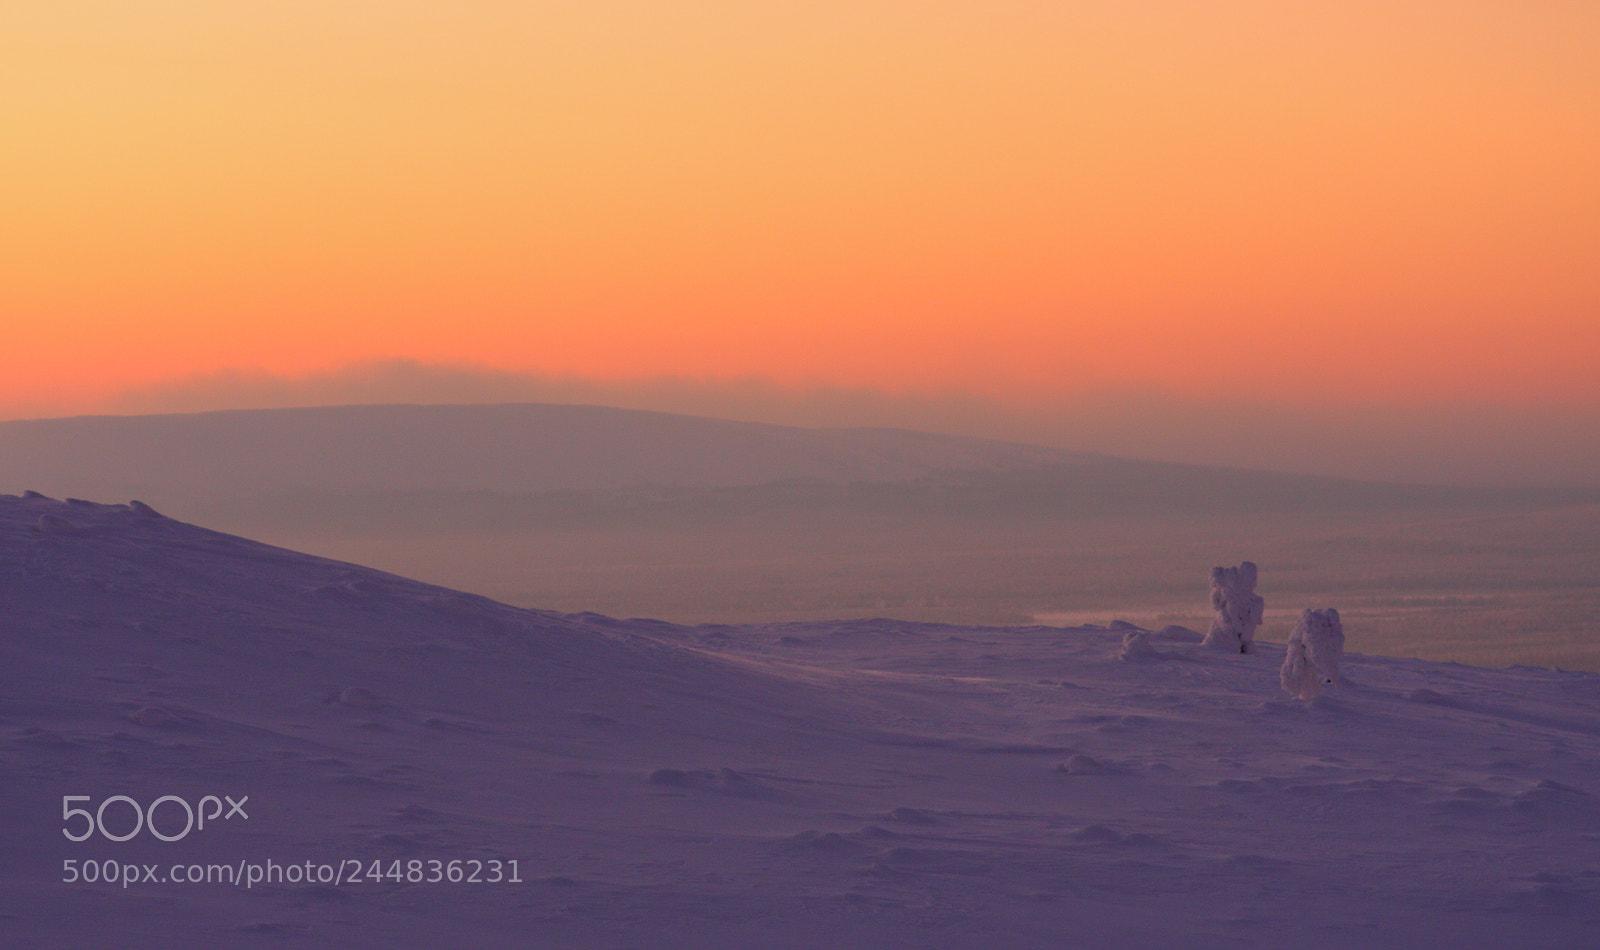 Arctic sunset, Canon EOS 40D, Canon EF 100mm f/2.8 Macro